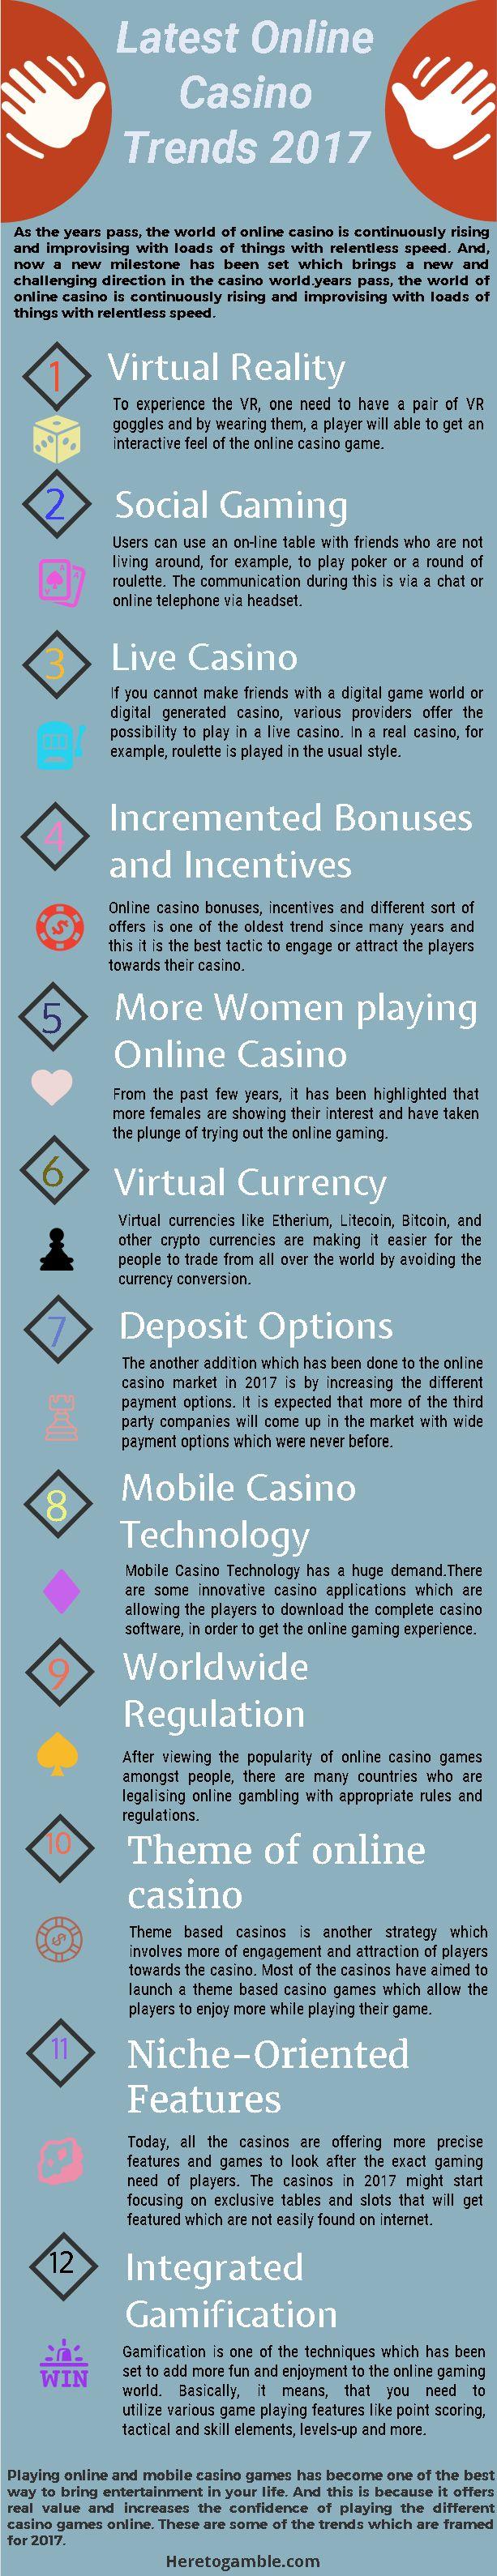 Latest Online Casino #Trends 2017 #onlinecasino #casino #games